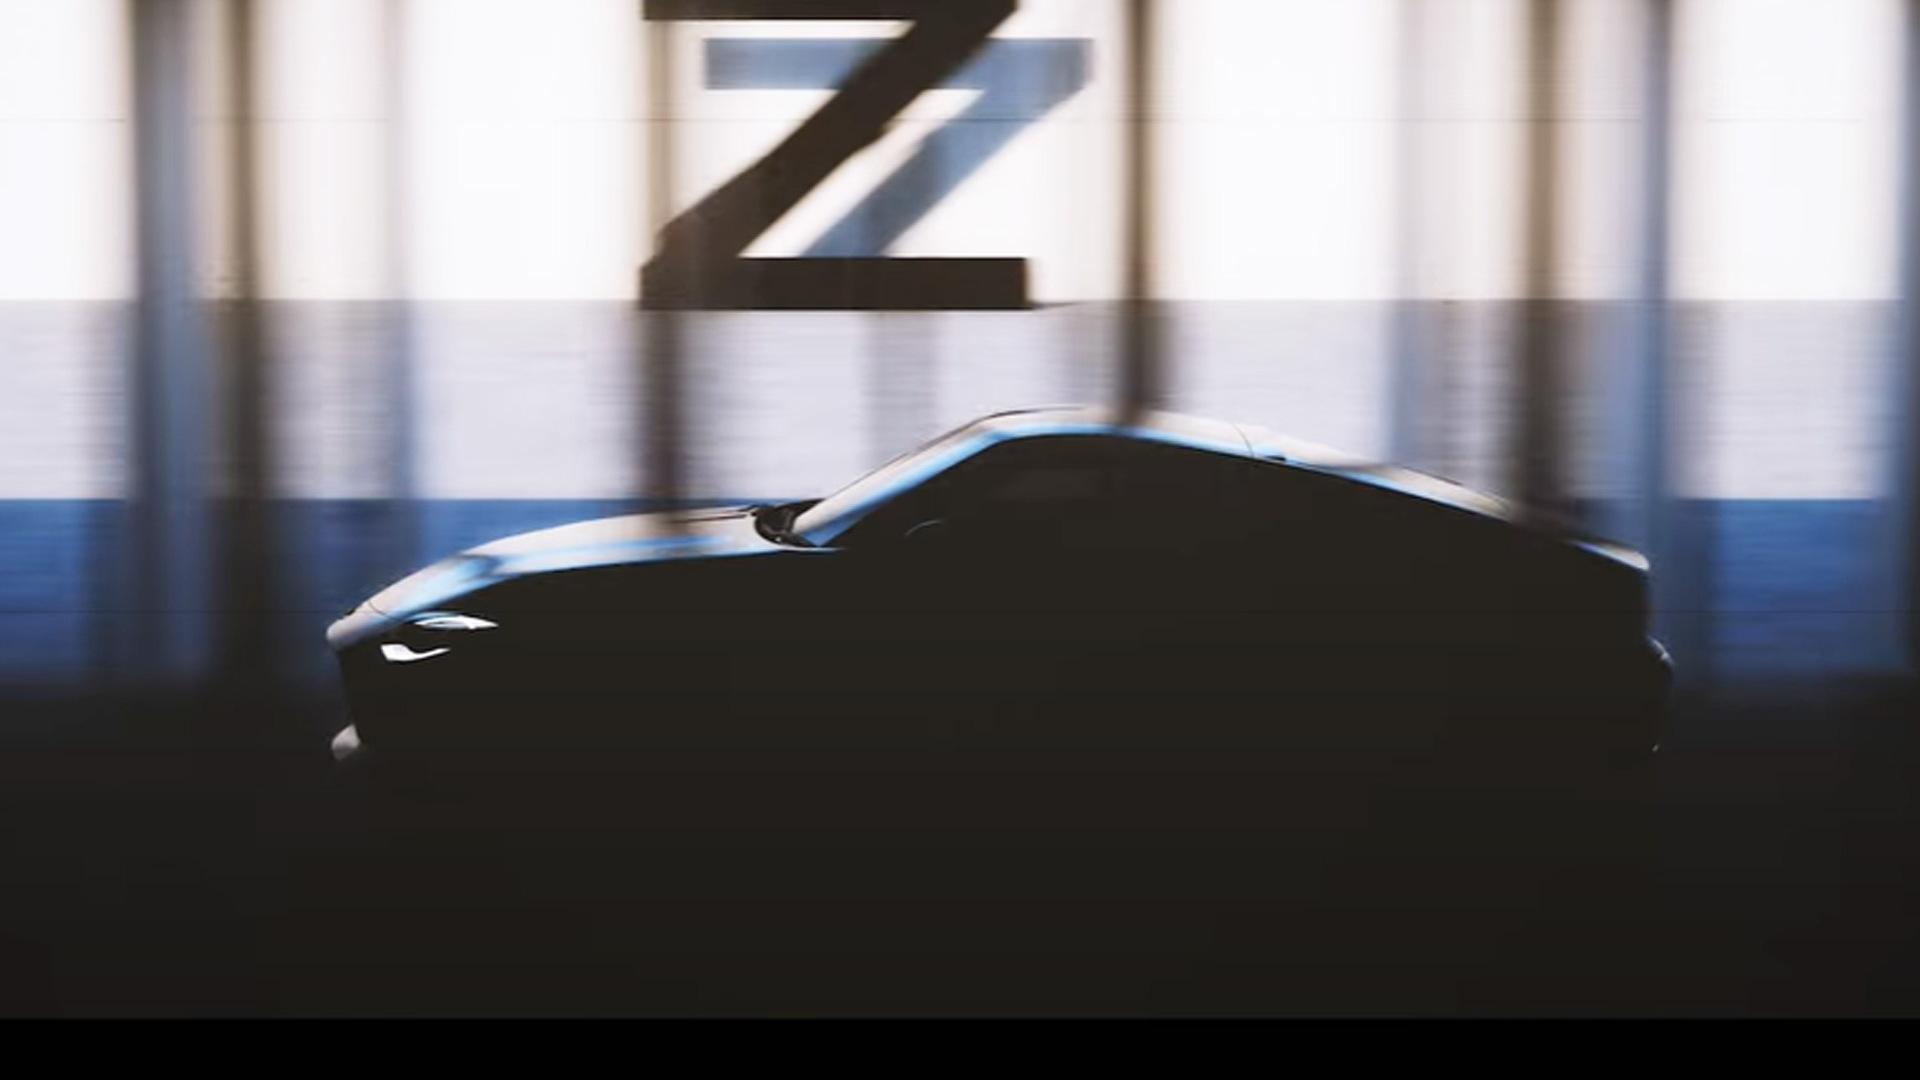 Teaser for next Nissan Z sports car